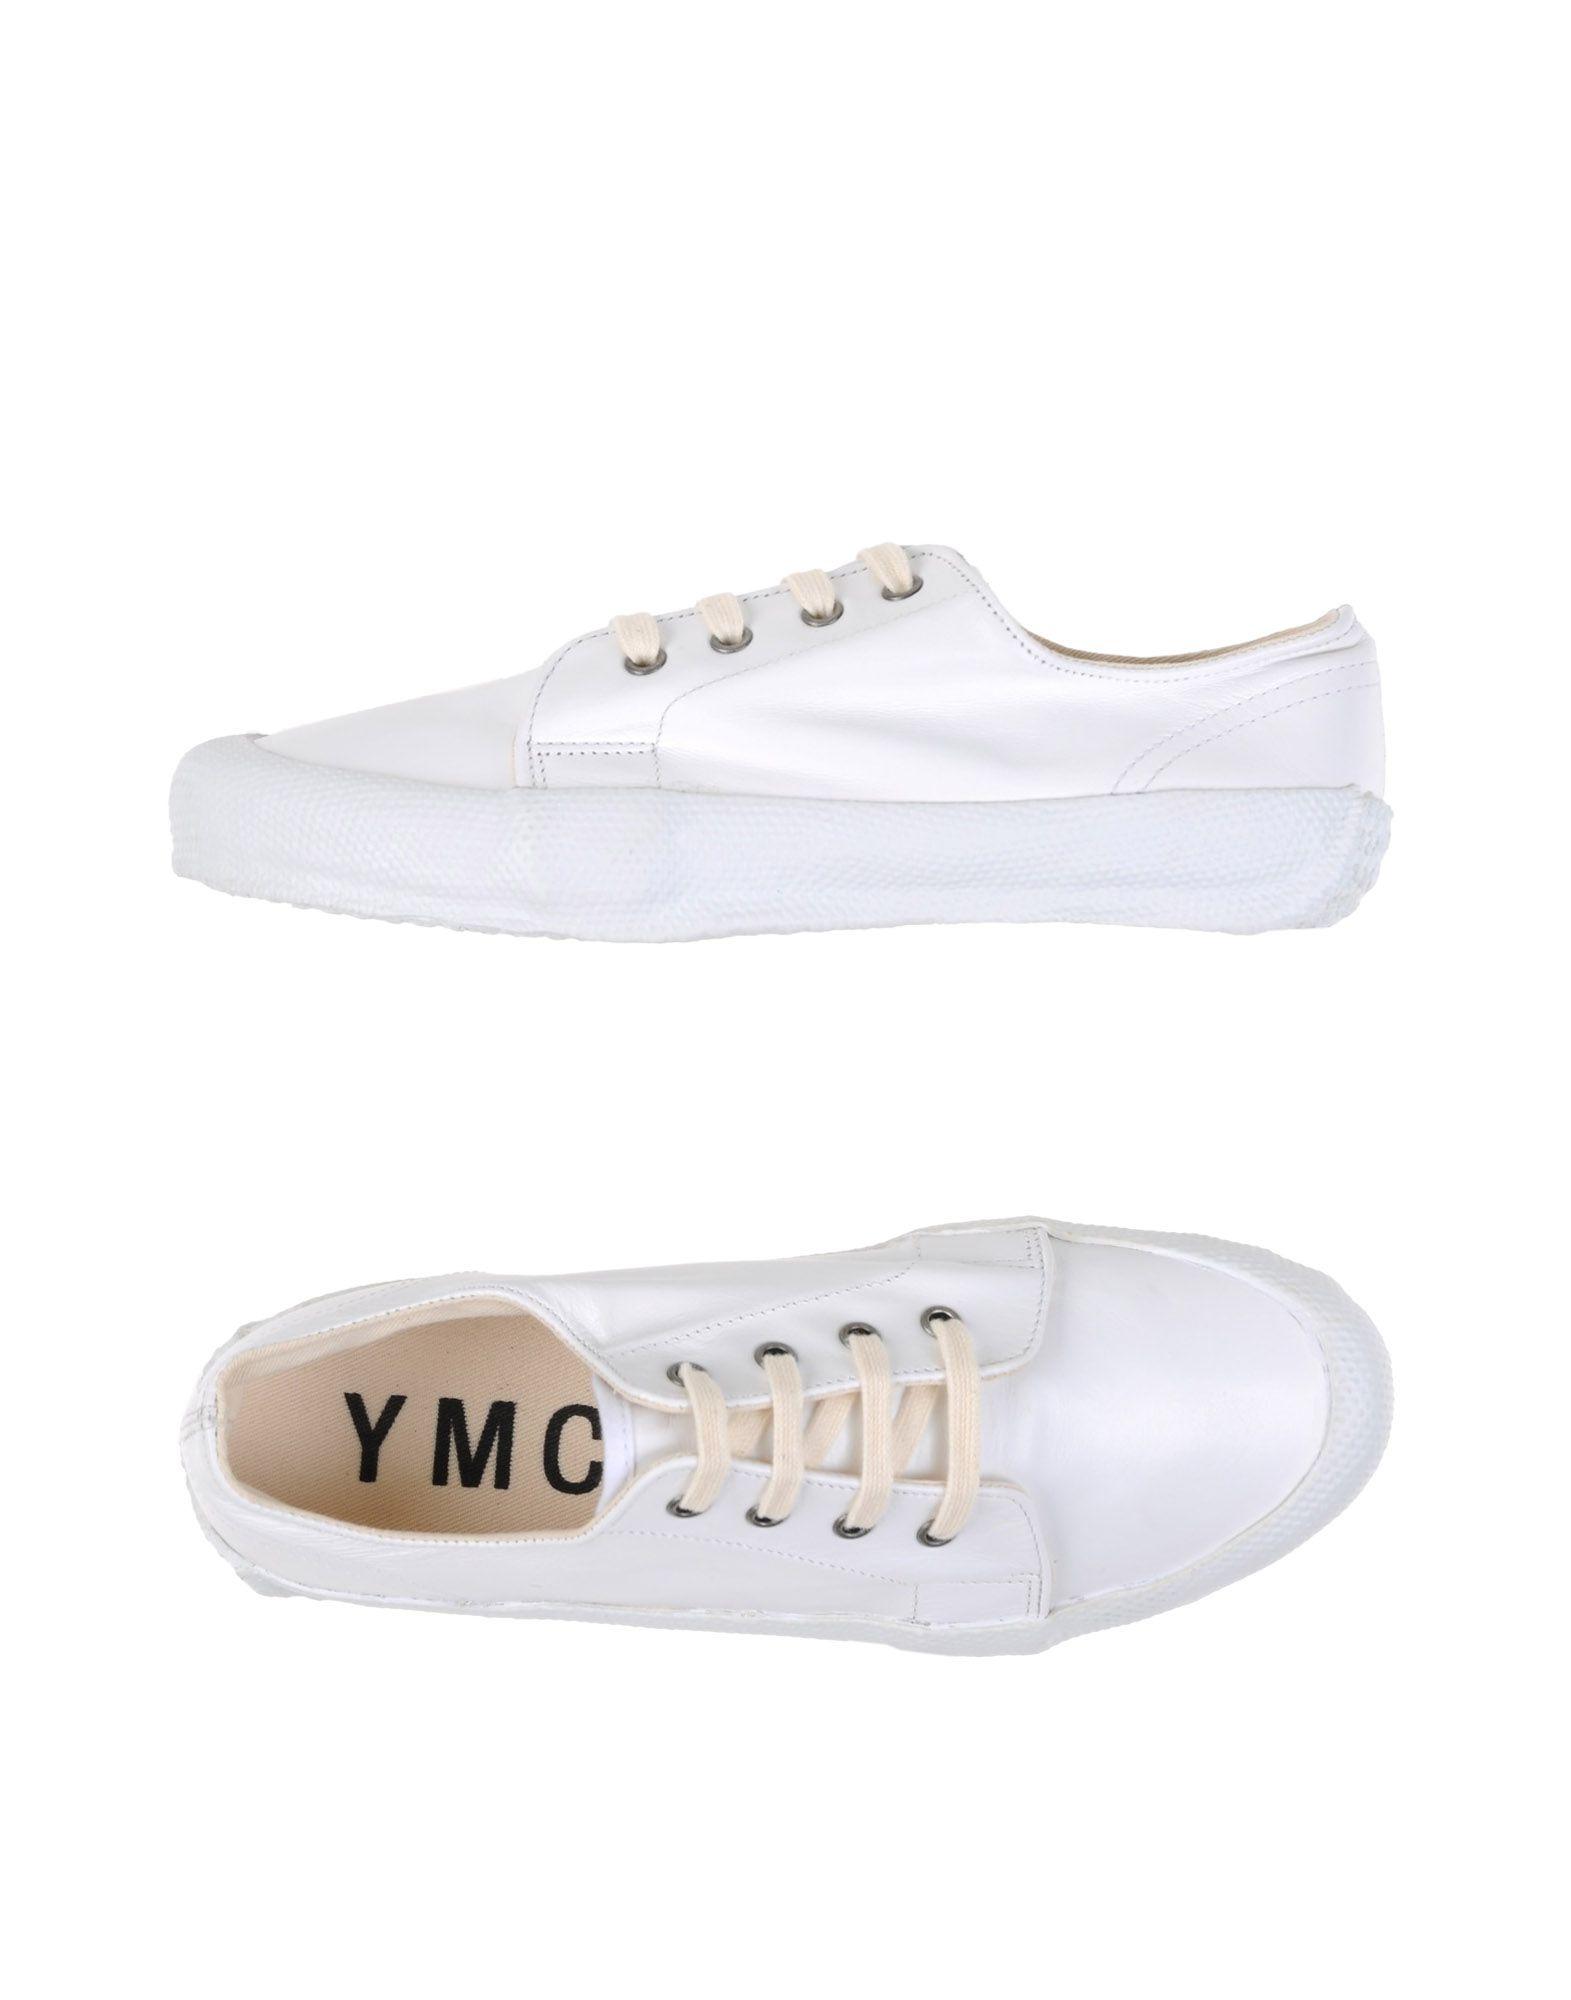 YMC YOU MUST CREATE Низкие кеды и кроссовки тетрадь на скрепке printio you must create